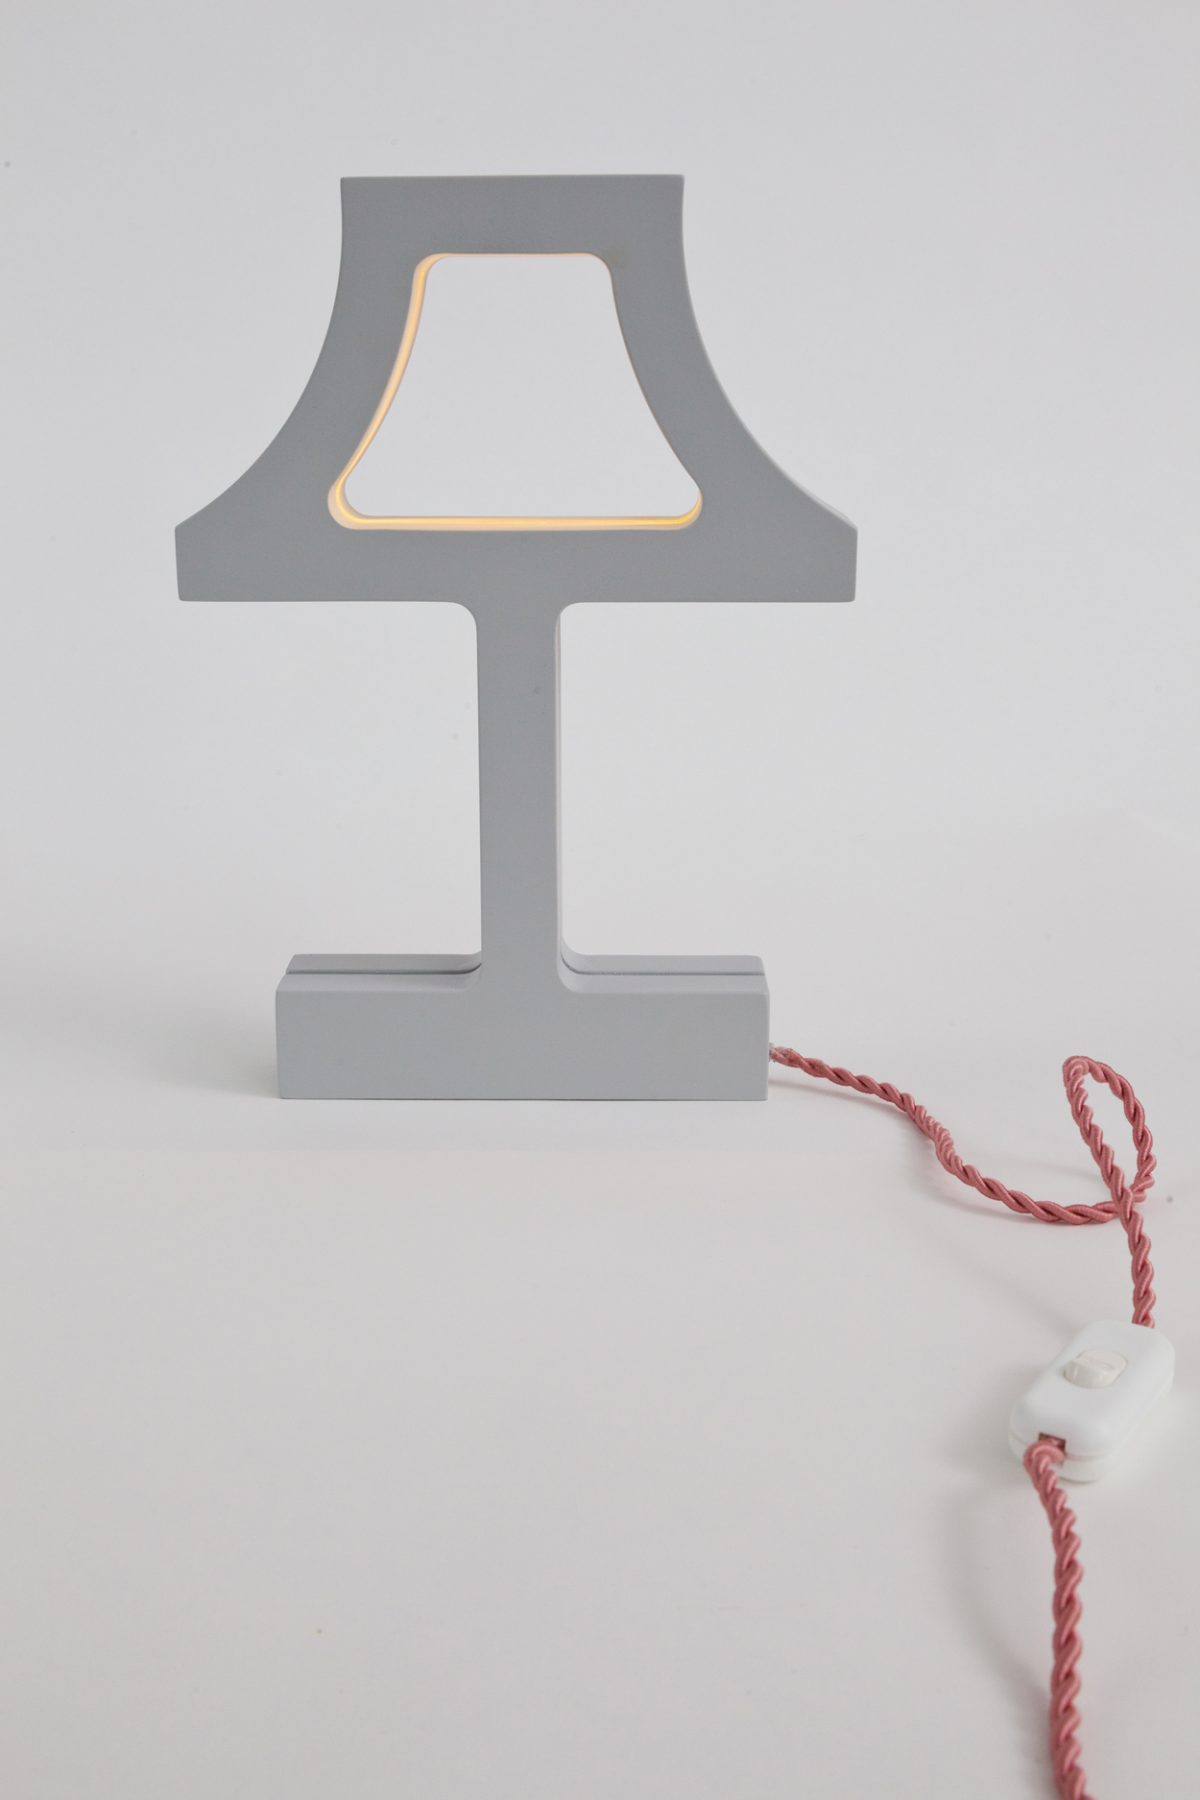 Tafellamp The Missing Bulb classic grijs rood snoer – Jolanda van Goor